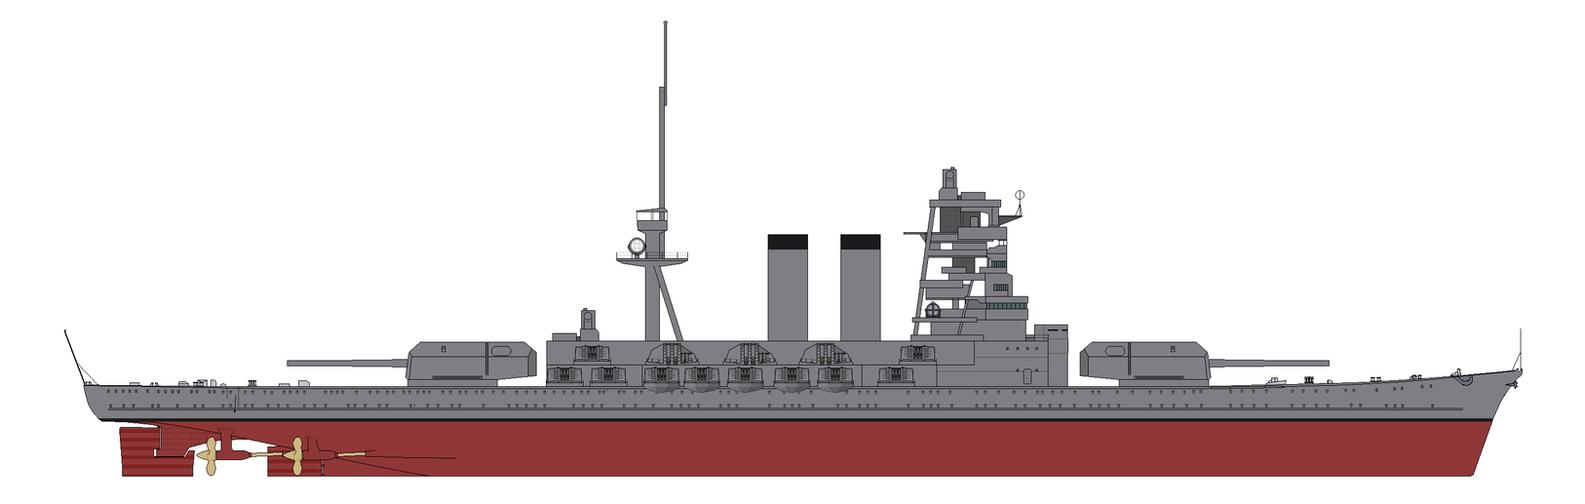 BMS Graf Spee by SenkanYamato